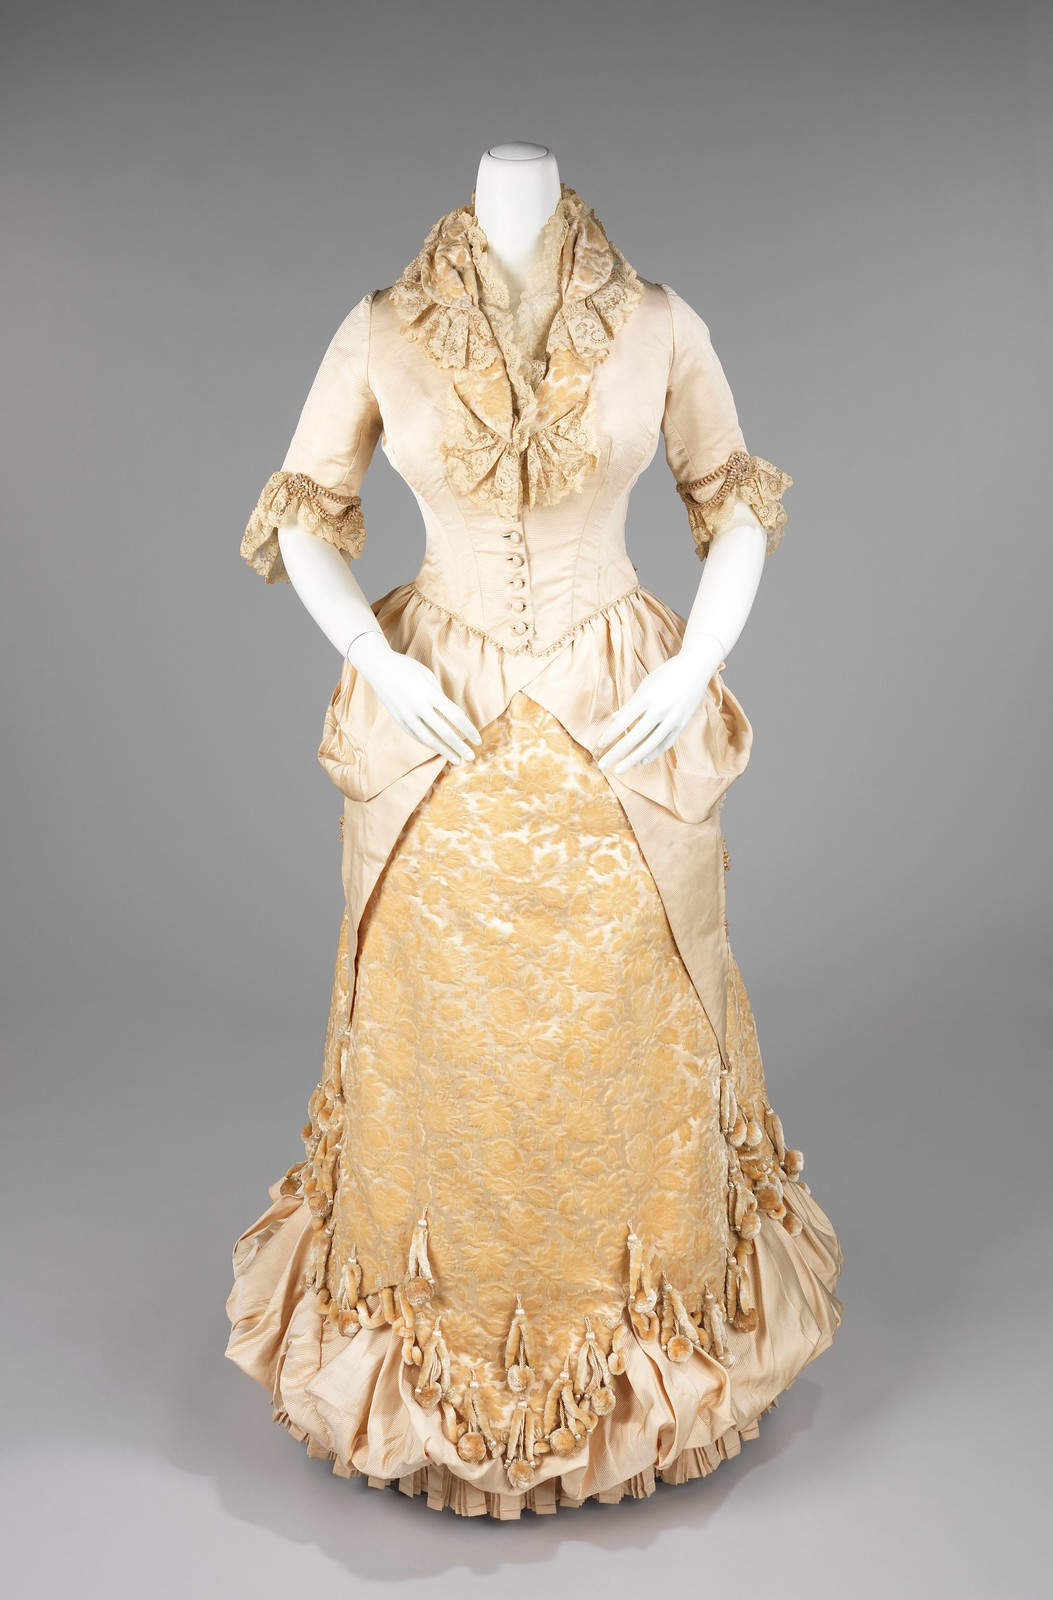 1885. American. Silk, linen. metmuseum